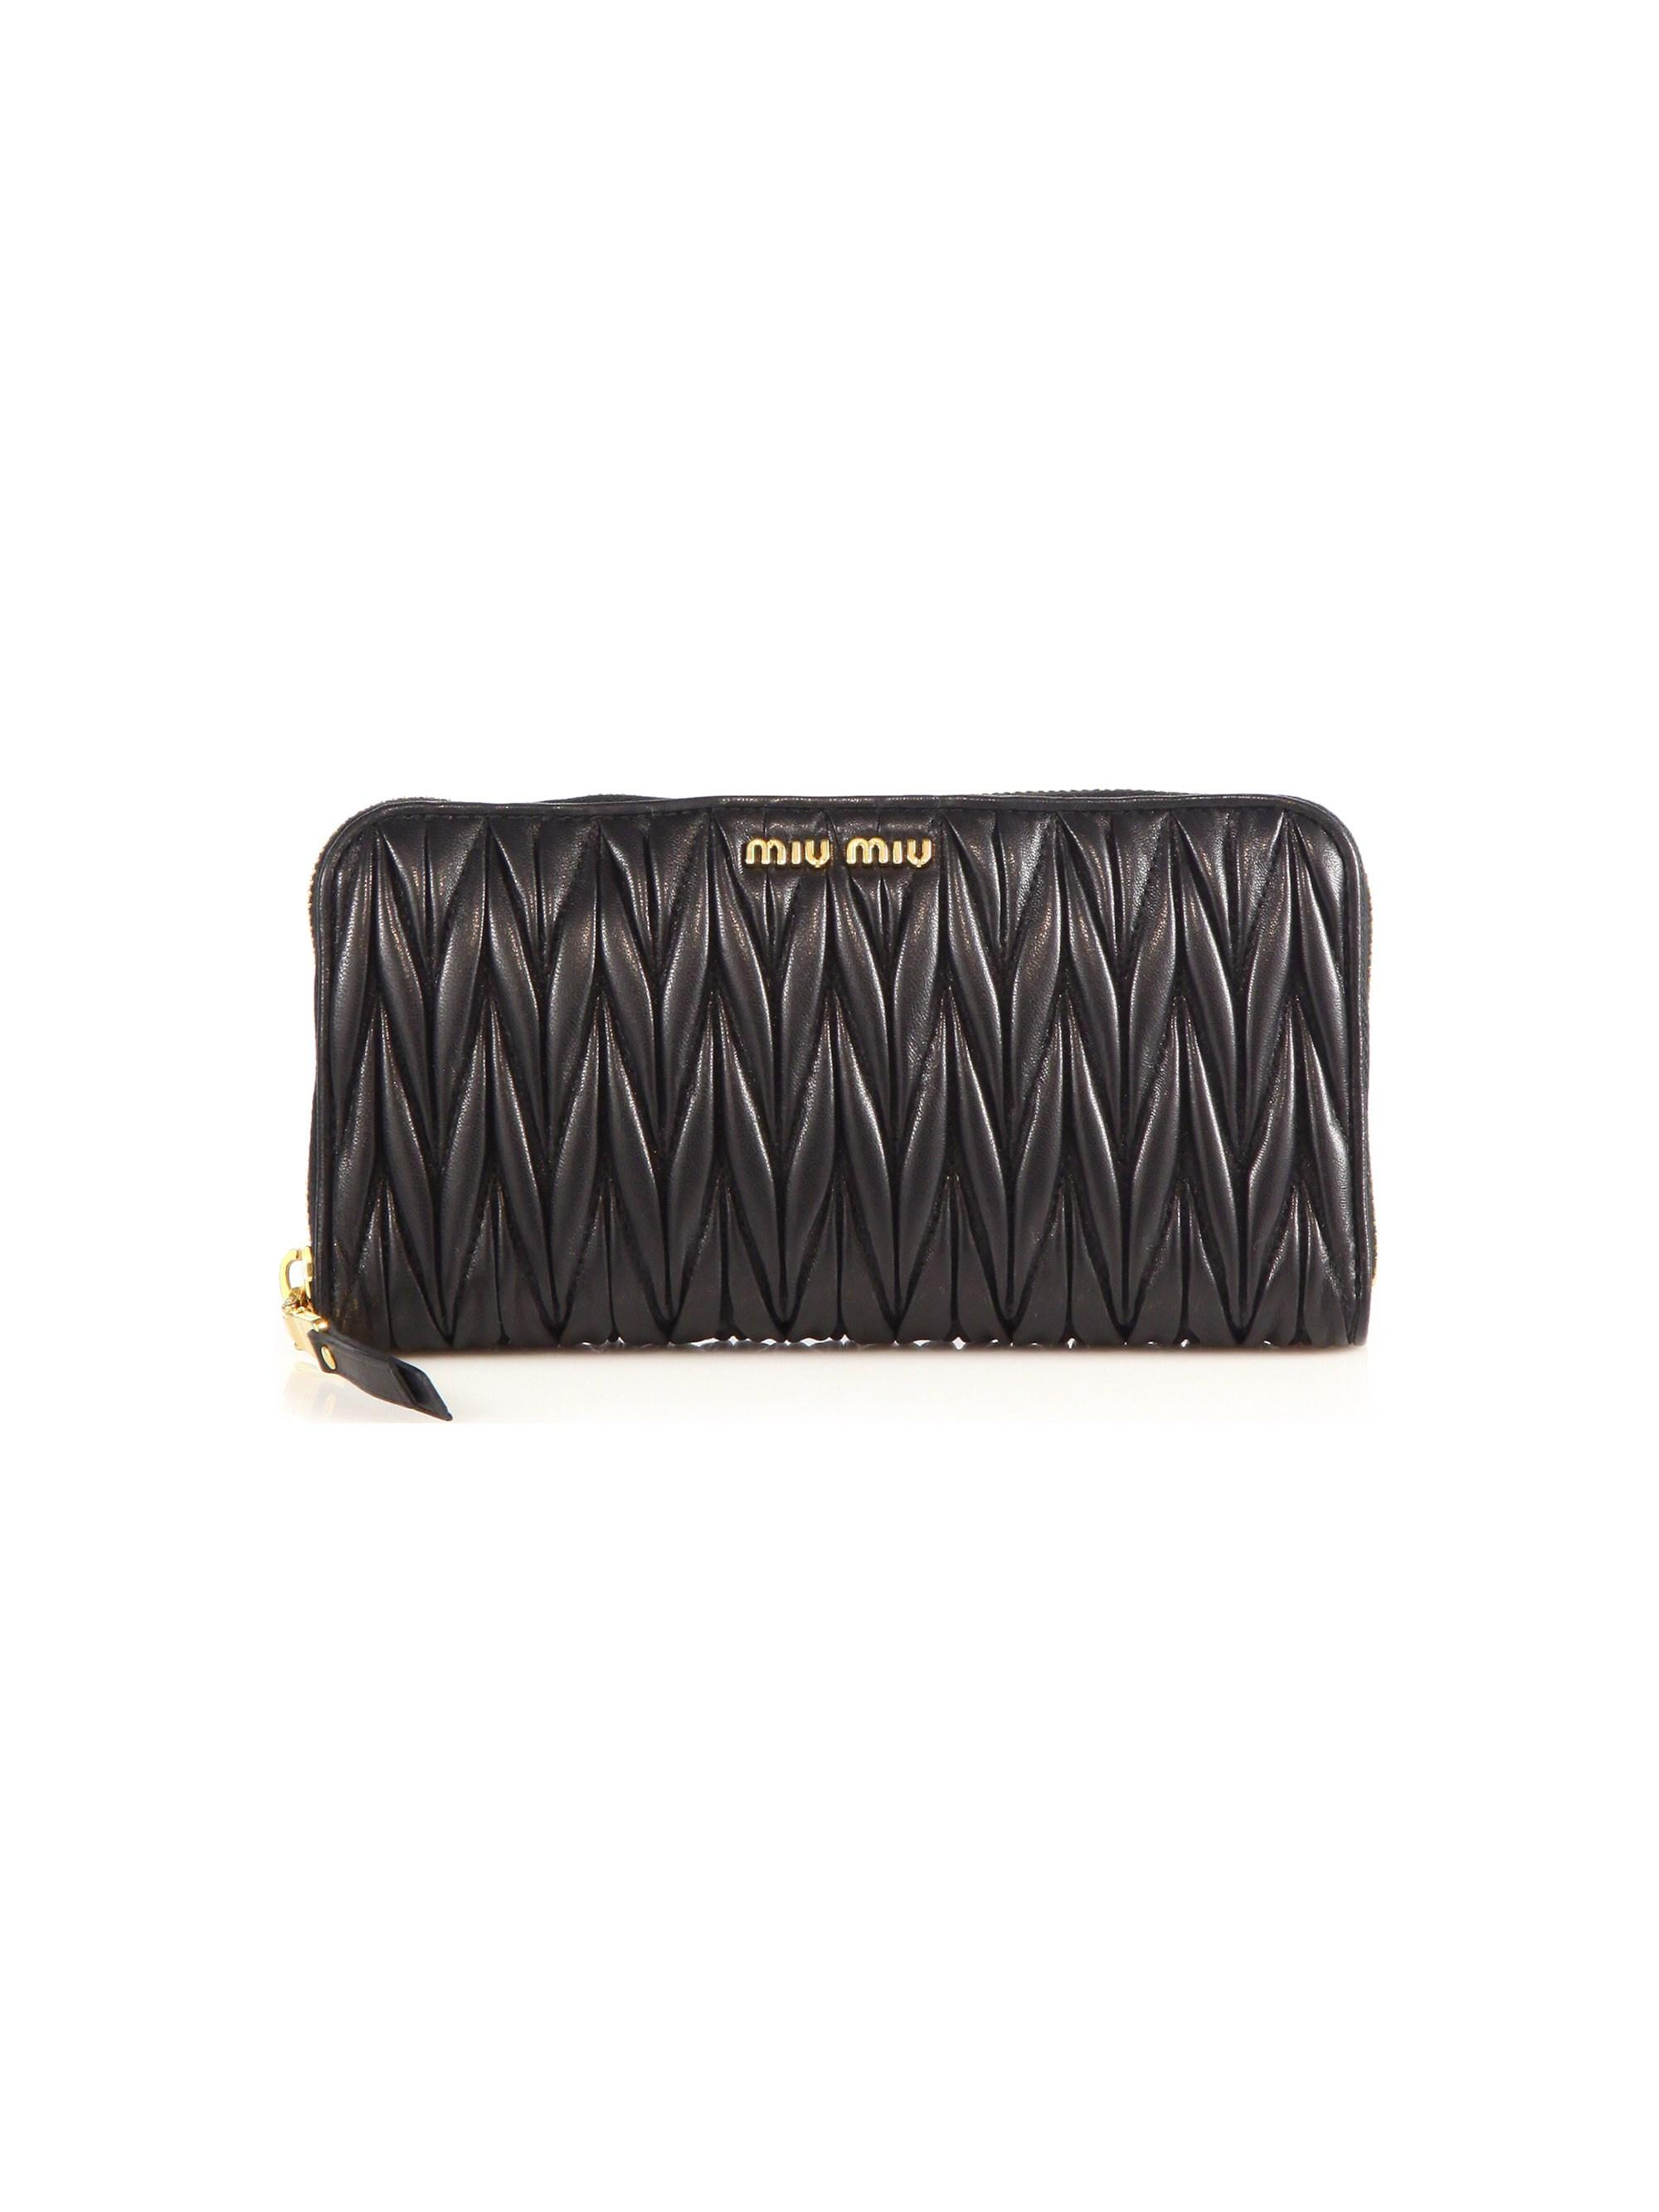 345837a52a09 Lyst - Miu Miu Matelasse Leather Zip Continental Wallet in Black ...